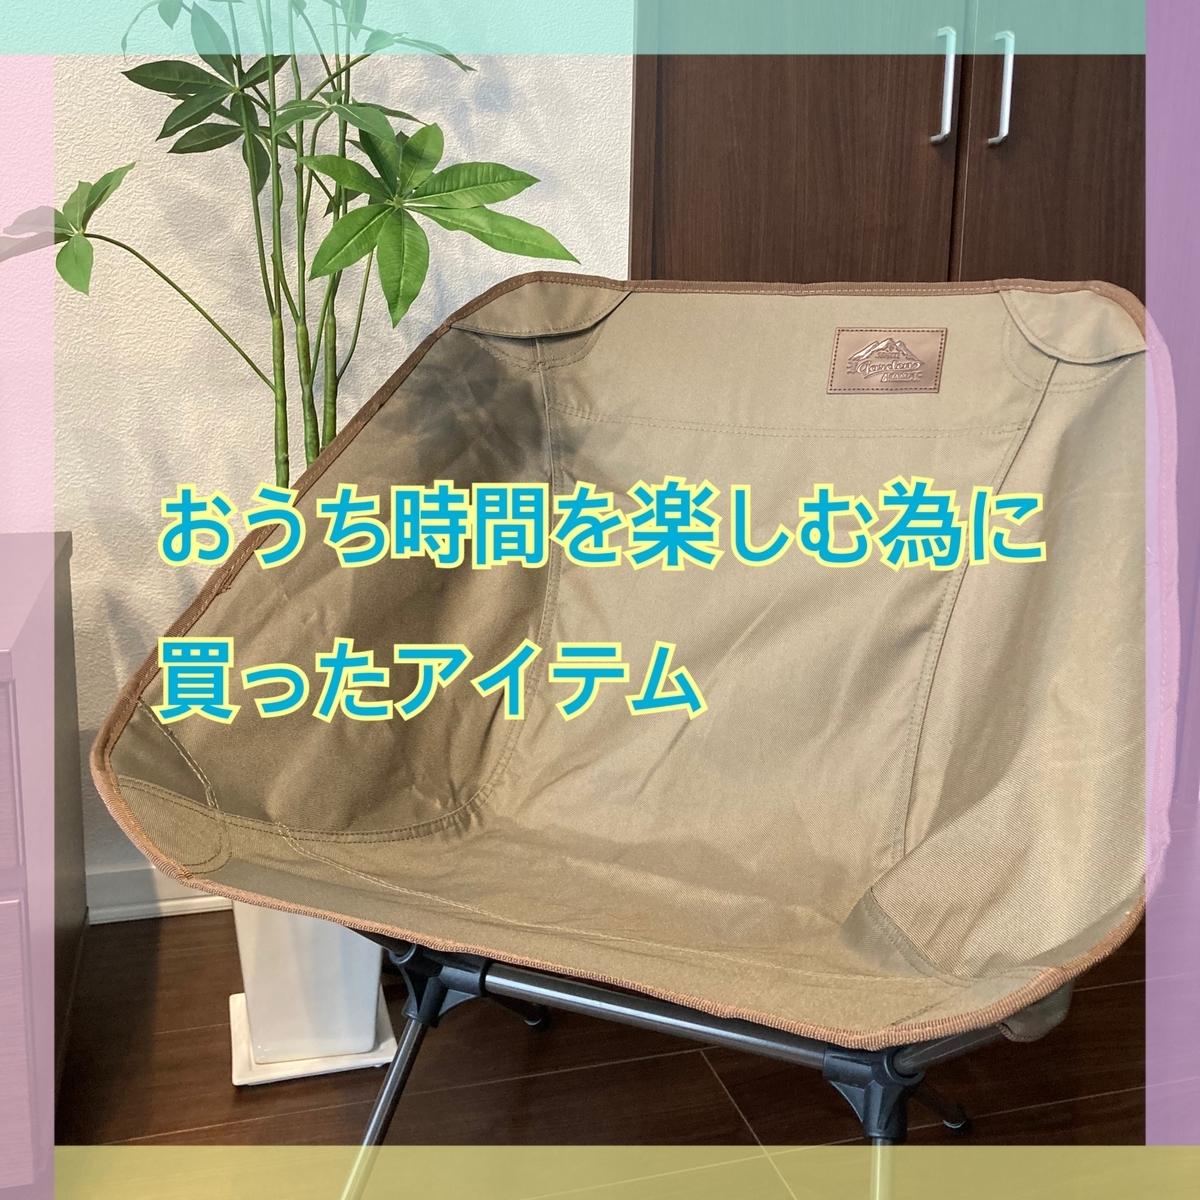 f:id:kinako_0128:20210505224124j:plain